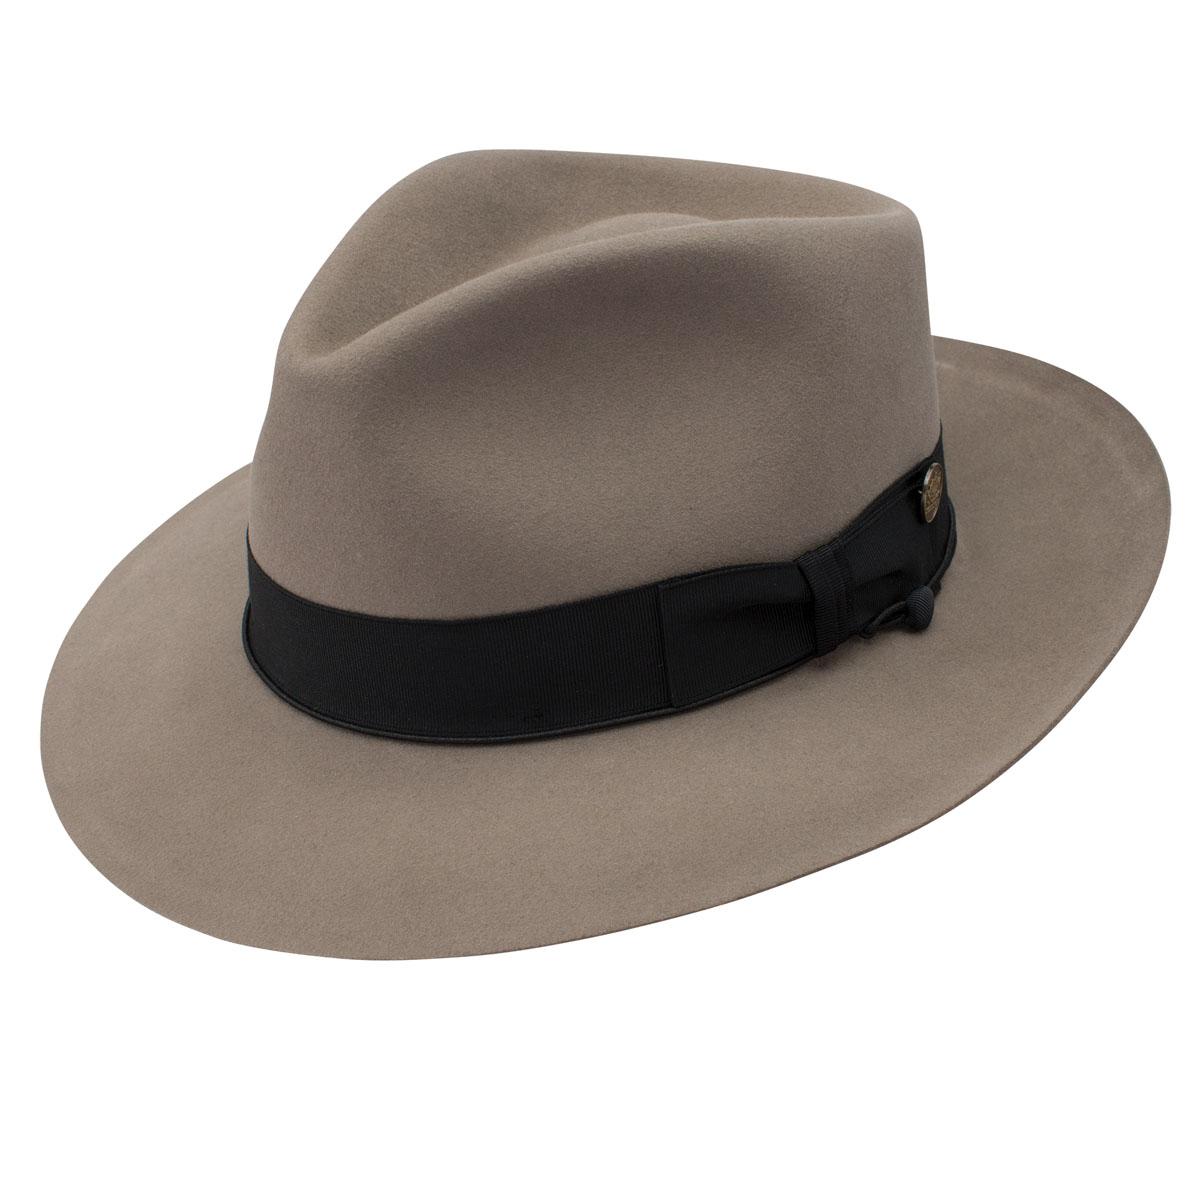 c6a7fbfa063 Stetson Bogie Beaver Fur Felt Fedora Delmonico Hatter